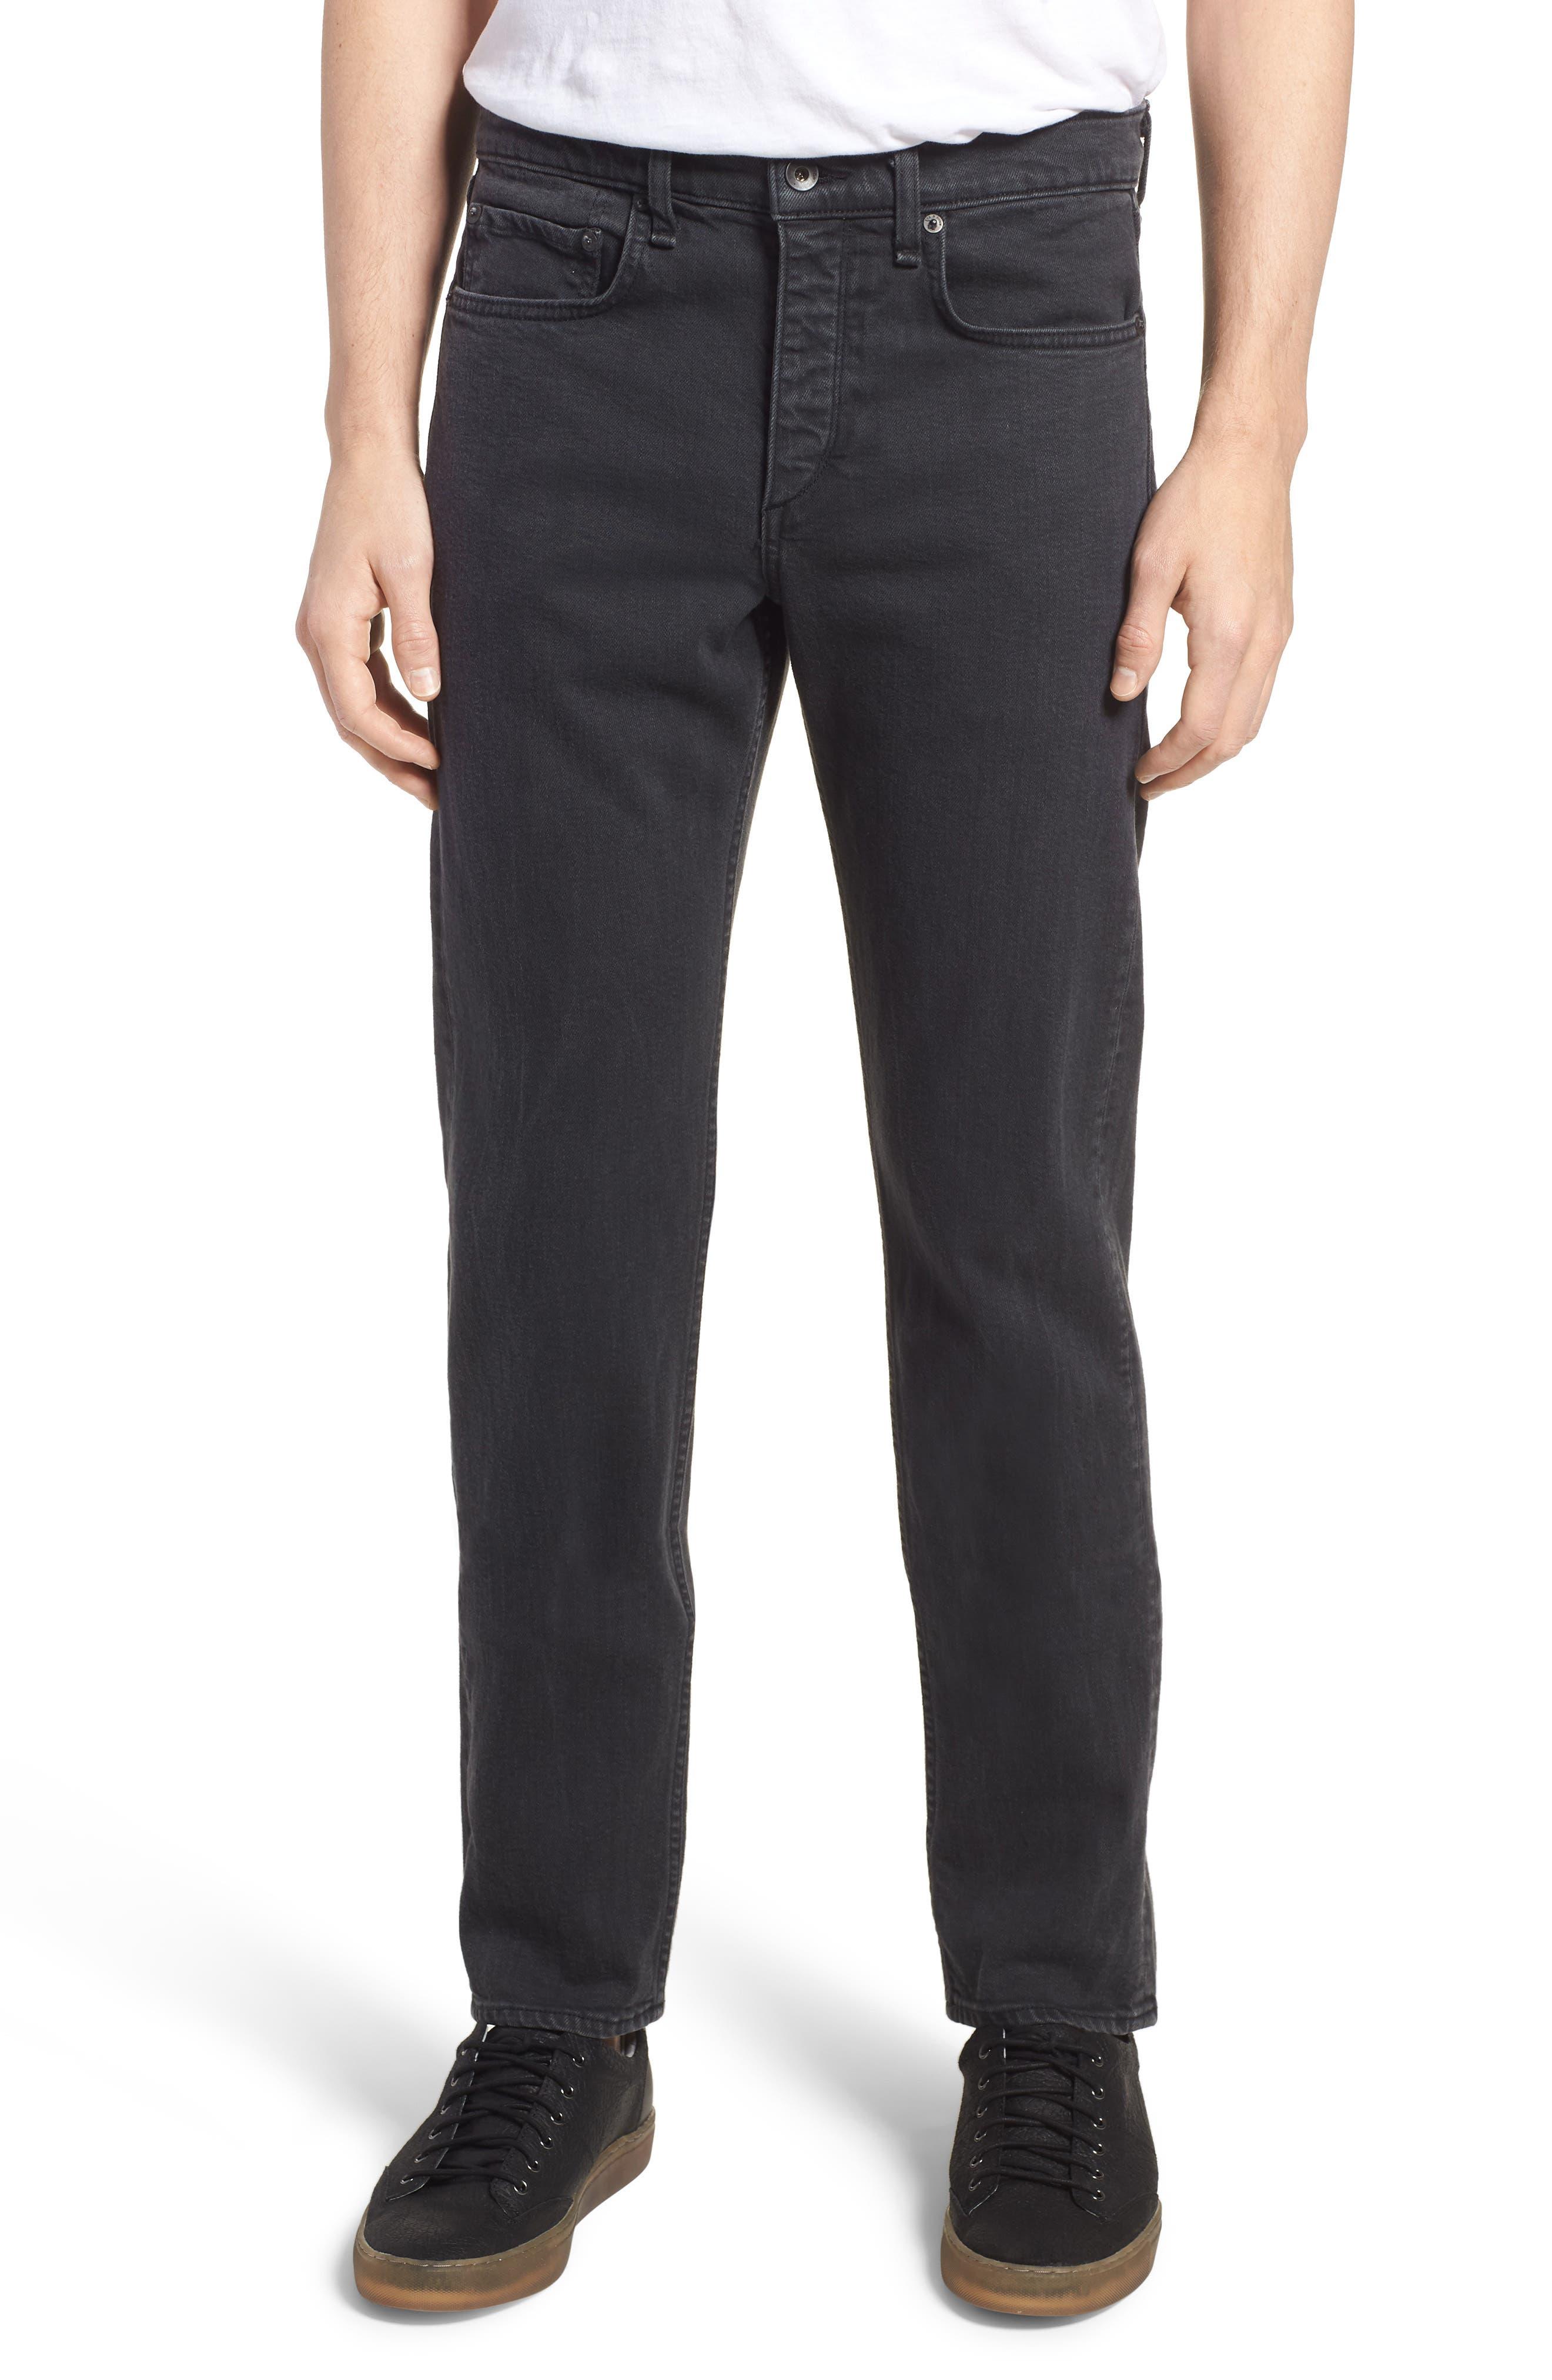 Fit 2 Slim Fit Jeans,                             Main thumbnail 1, color,                             SHELTER